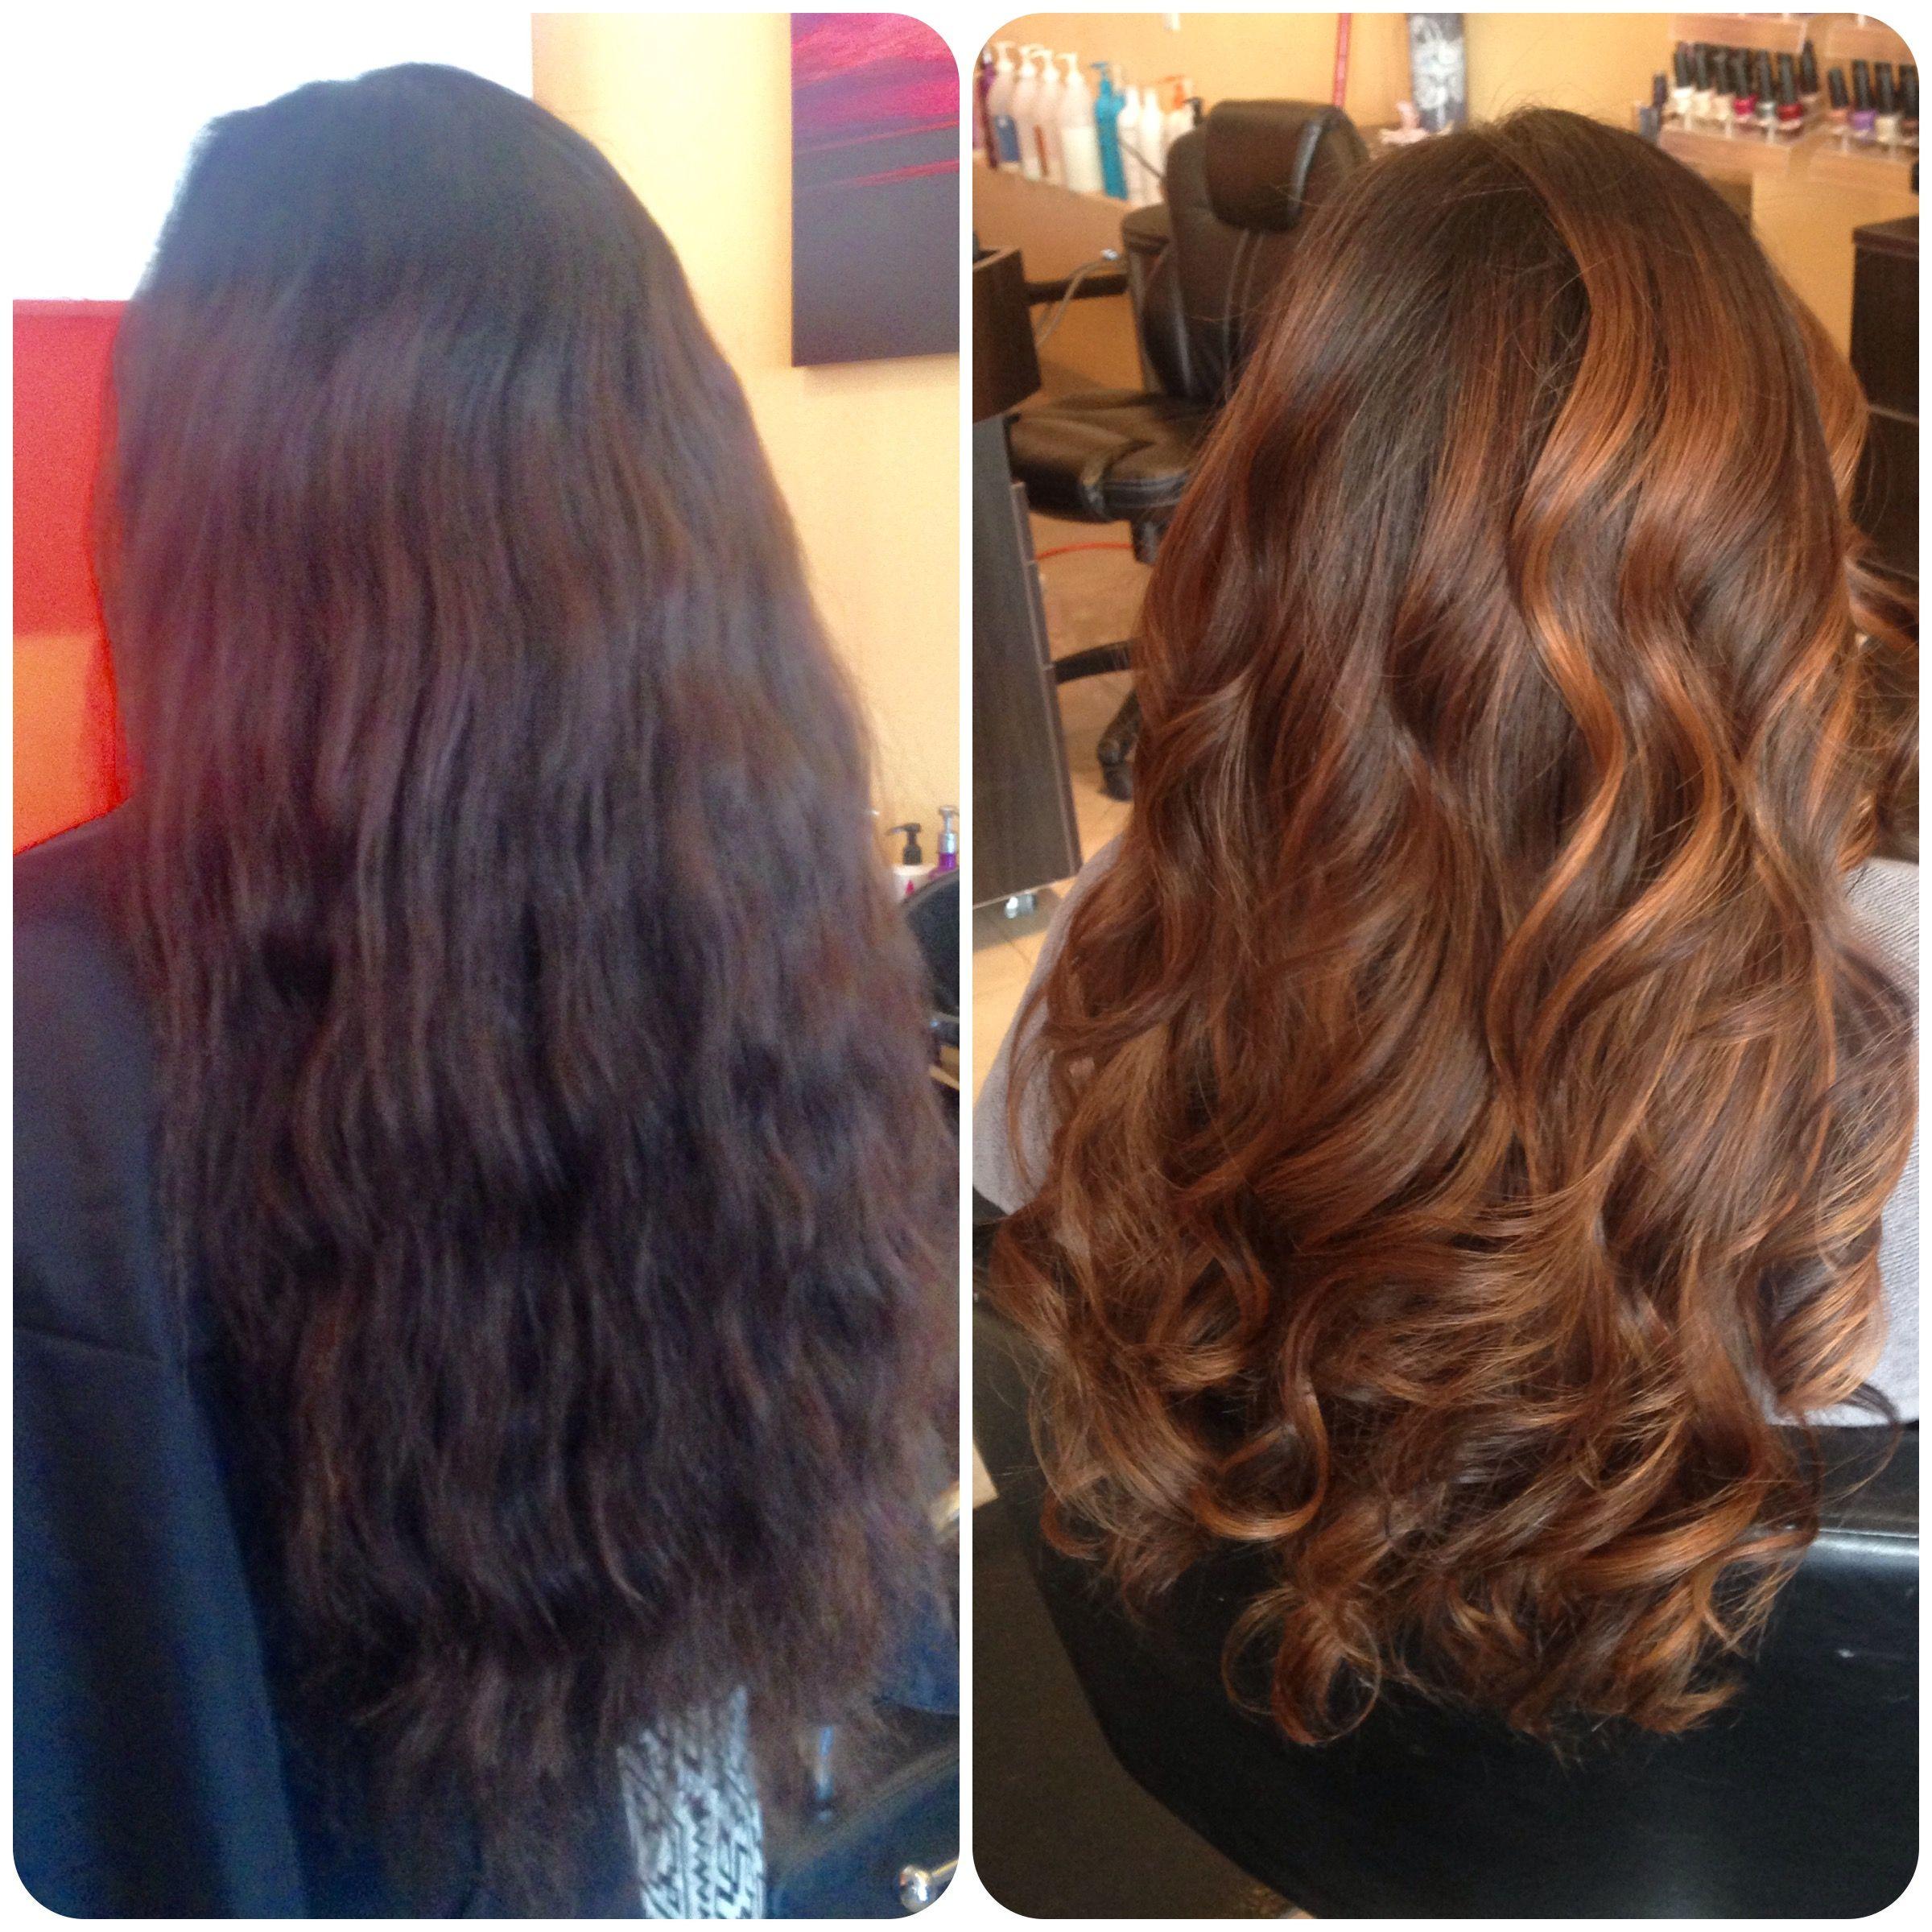 Beauty 101 Hair Salon Oceanside Natural Hair Salons Natural Hair Styles Beauty 101